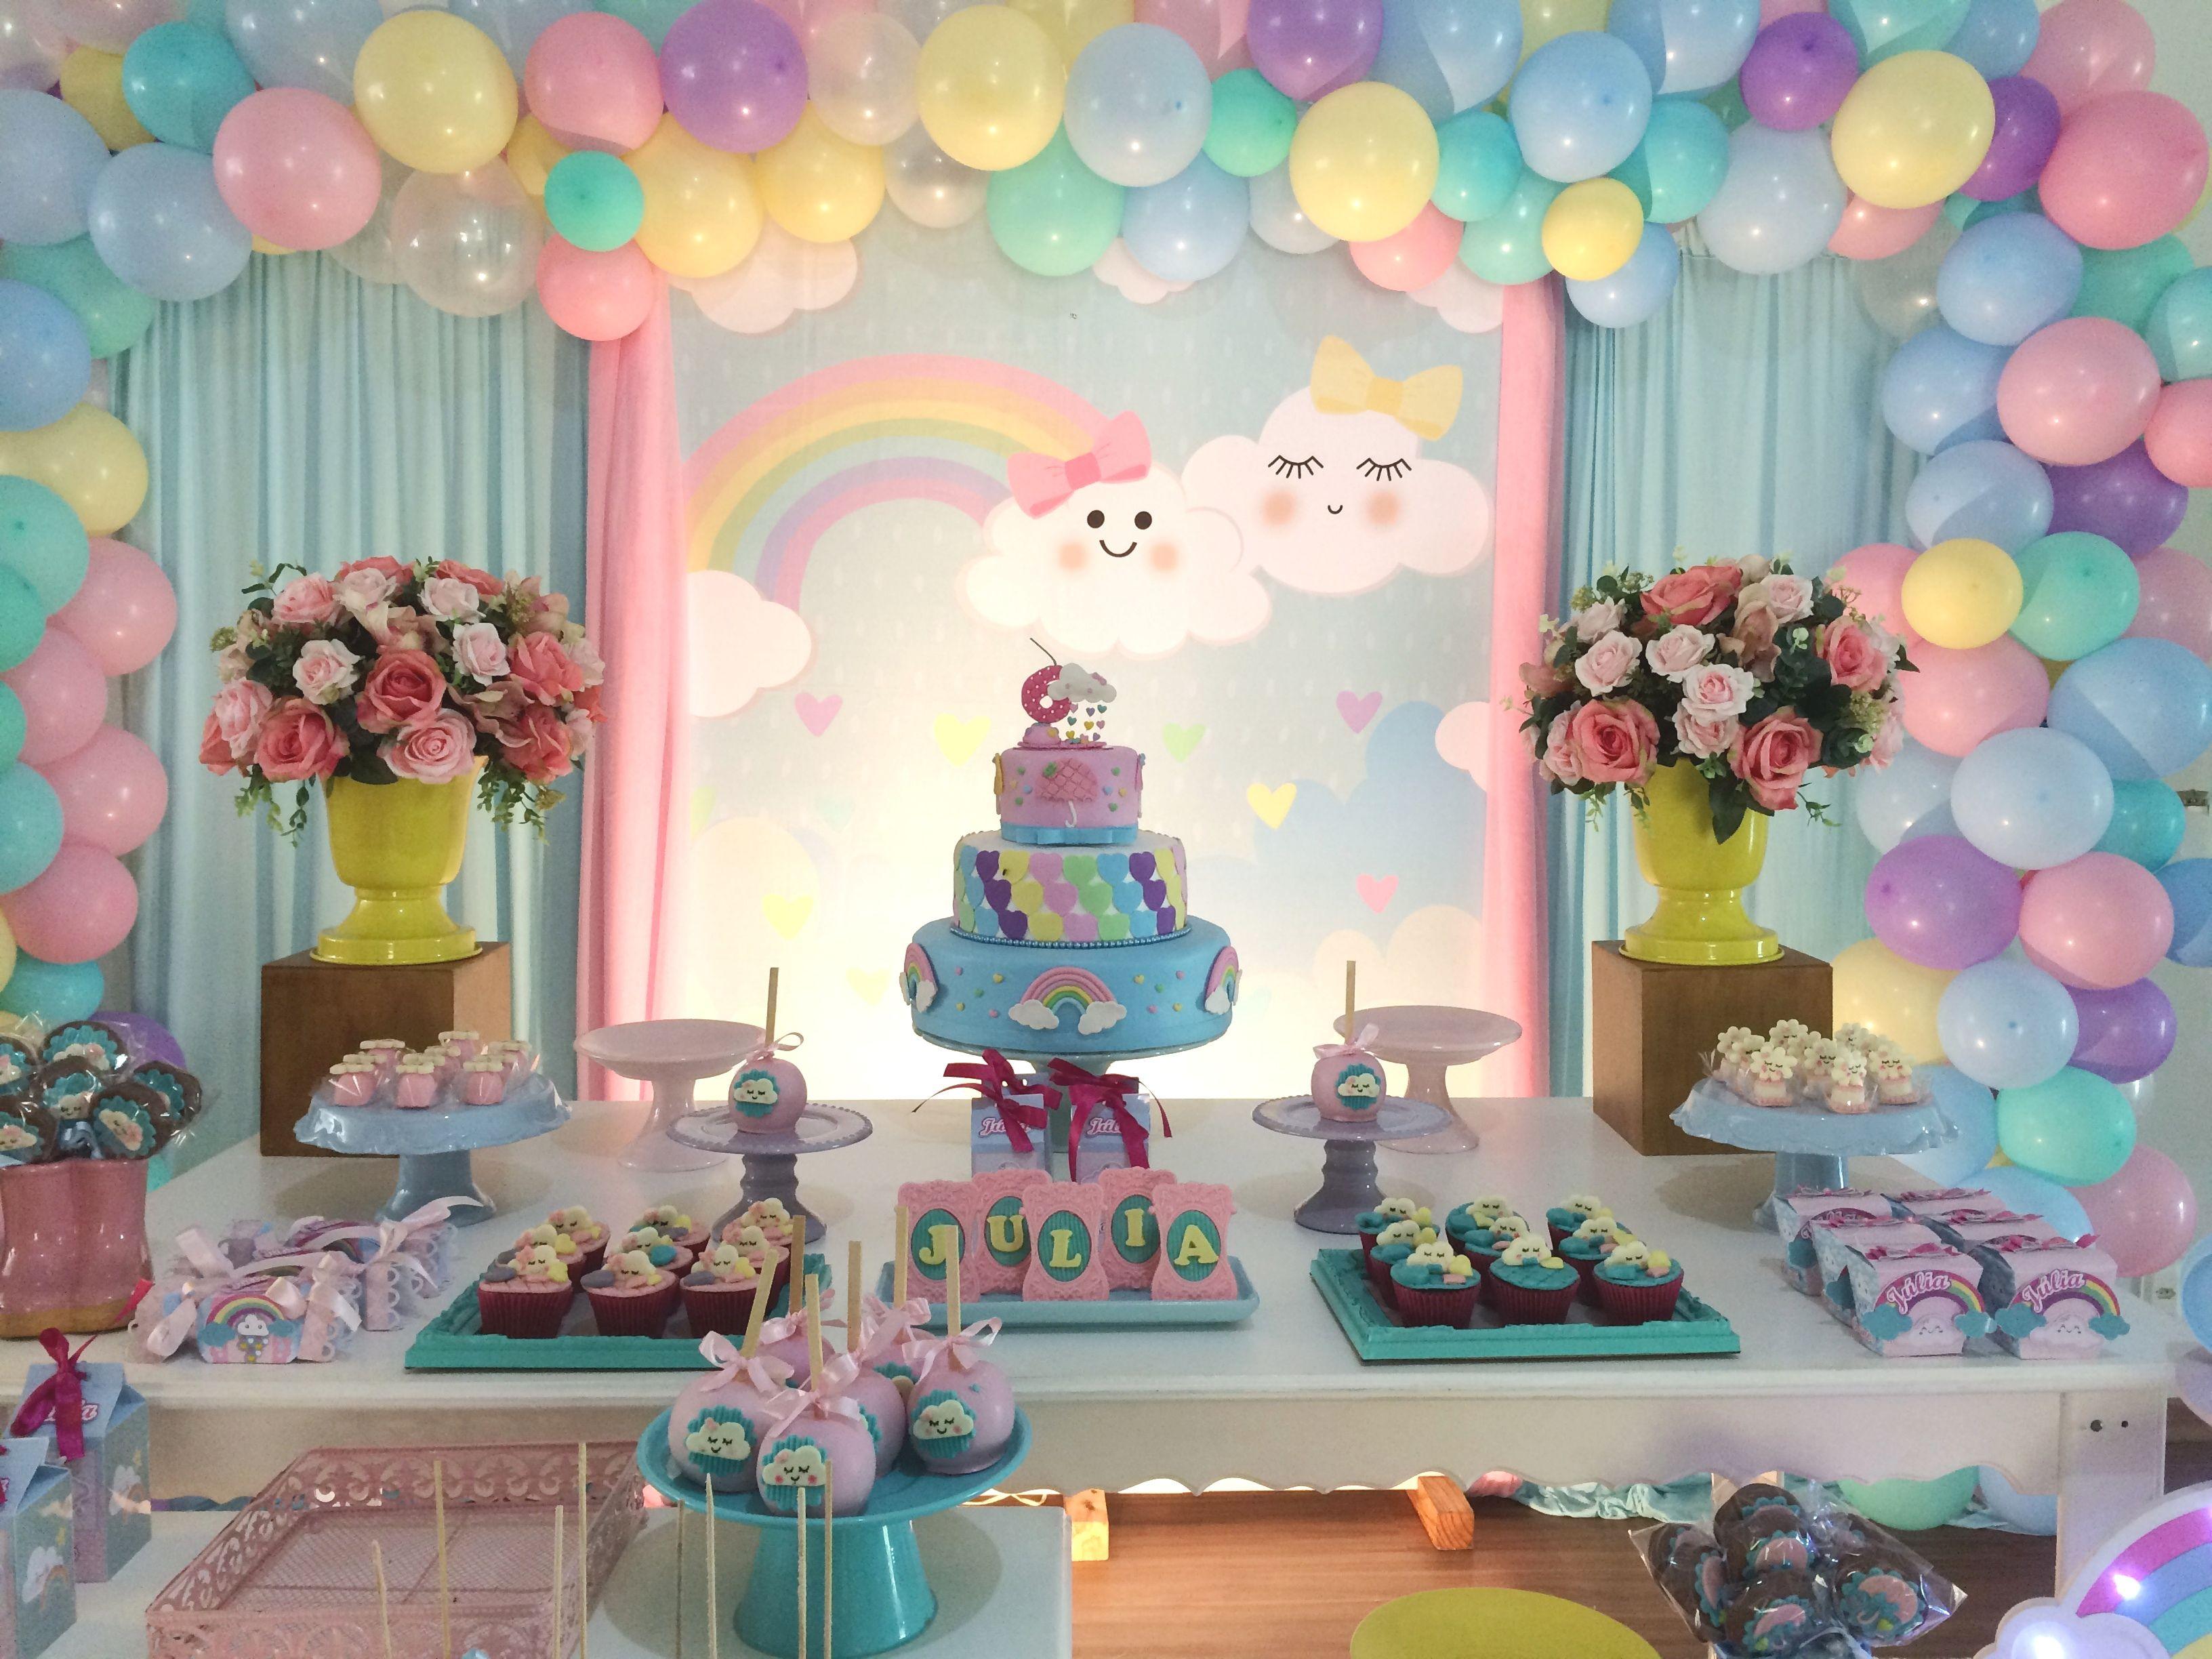 Decoraç u00e3o Chuva de Amor Festas Infantis Cloud party, Bubble birthday parties e Rainbow birt -> Decoração Festa Aniversario Chuva De Amor